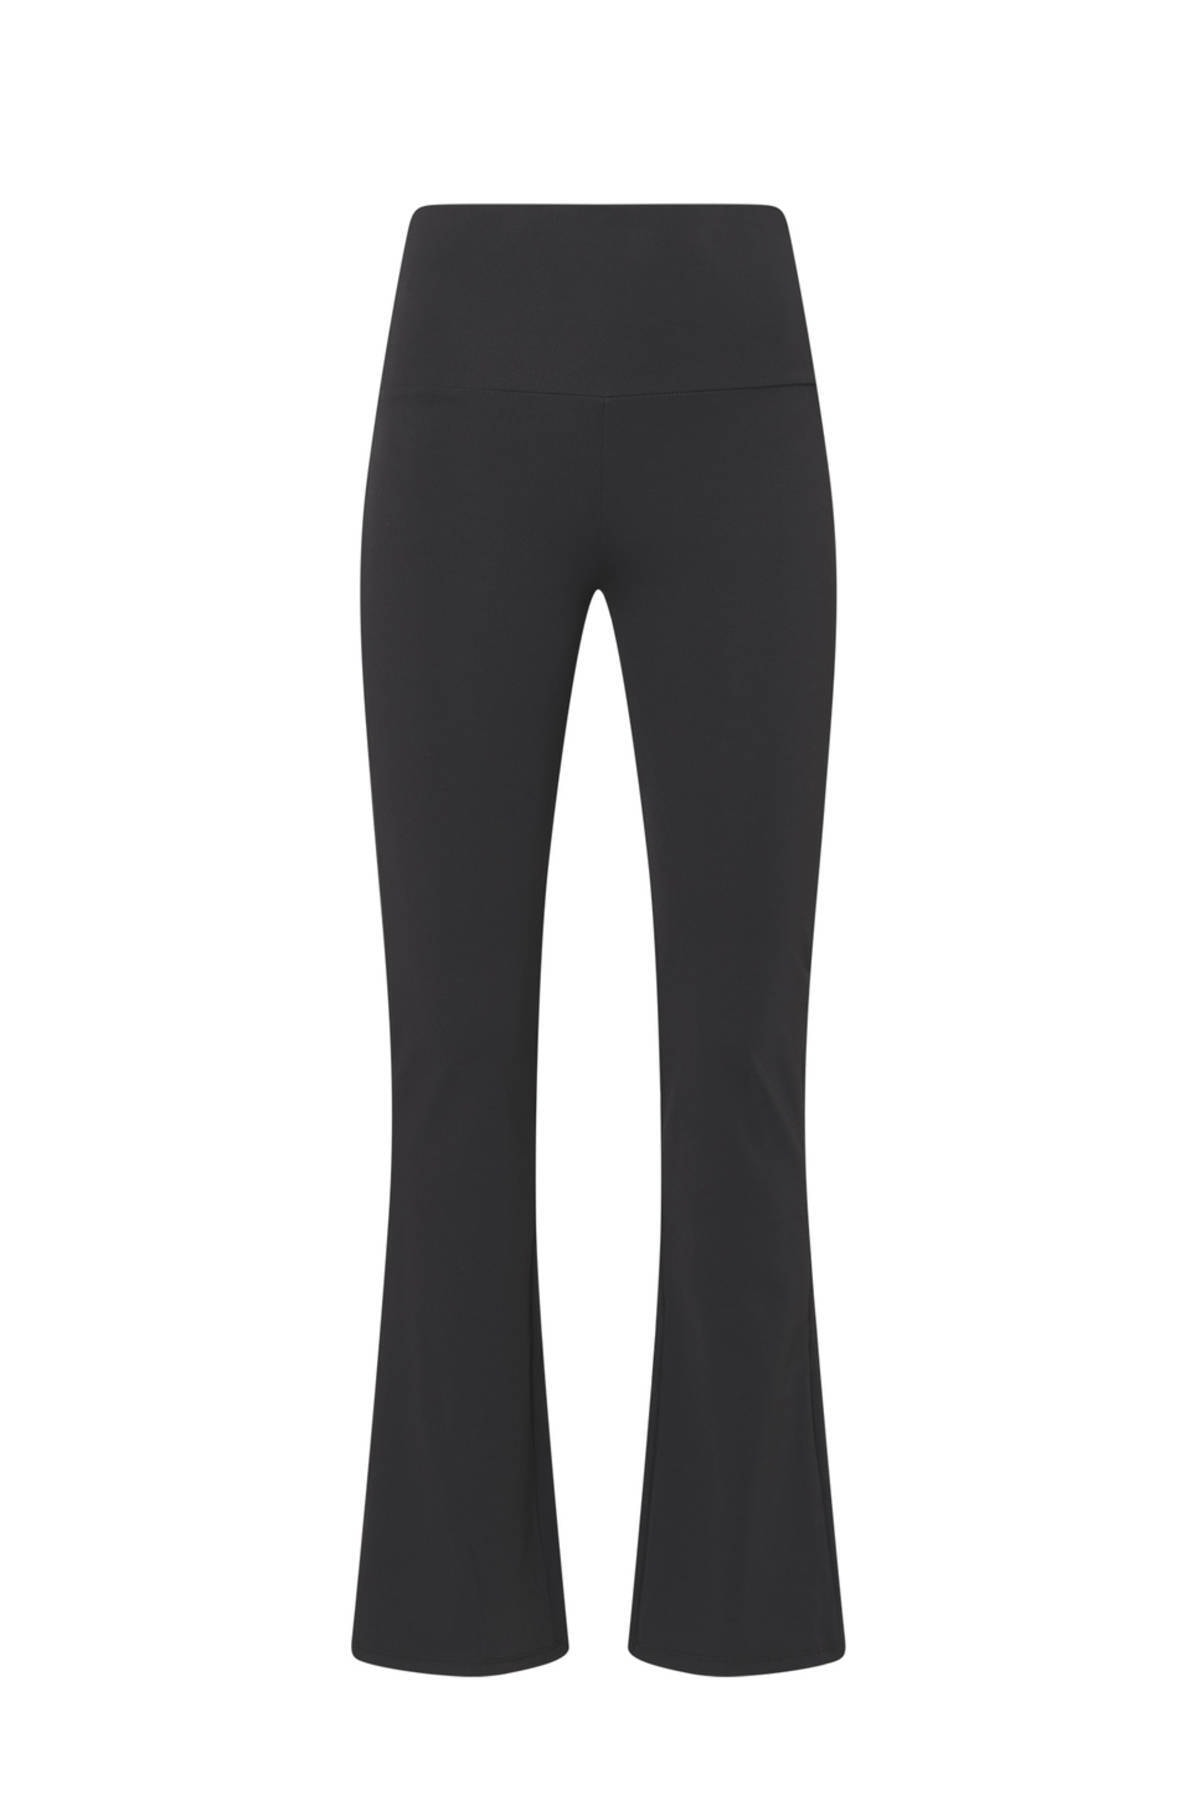 Oysho Kadın Siyah Flare Comfort Pantolon 3